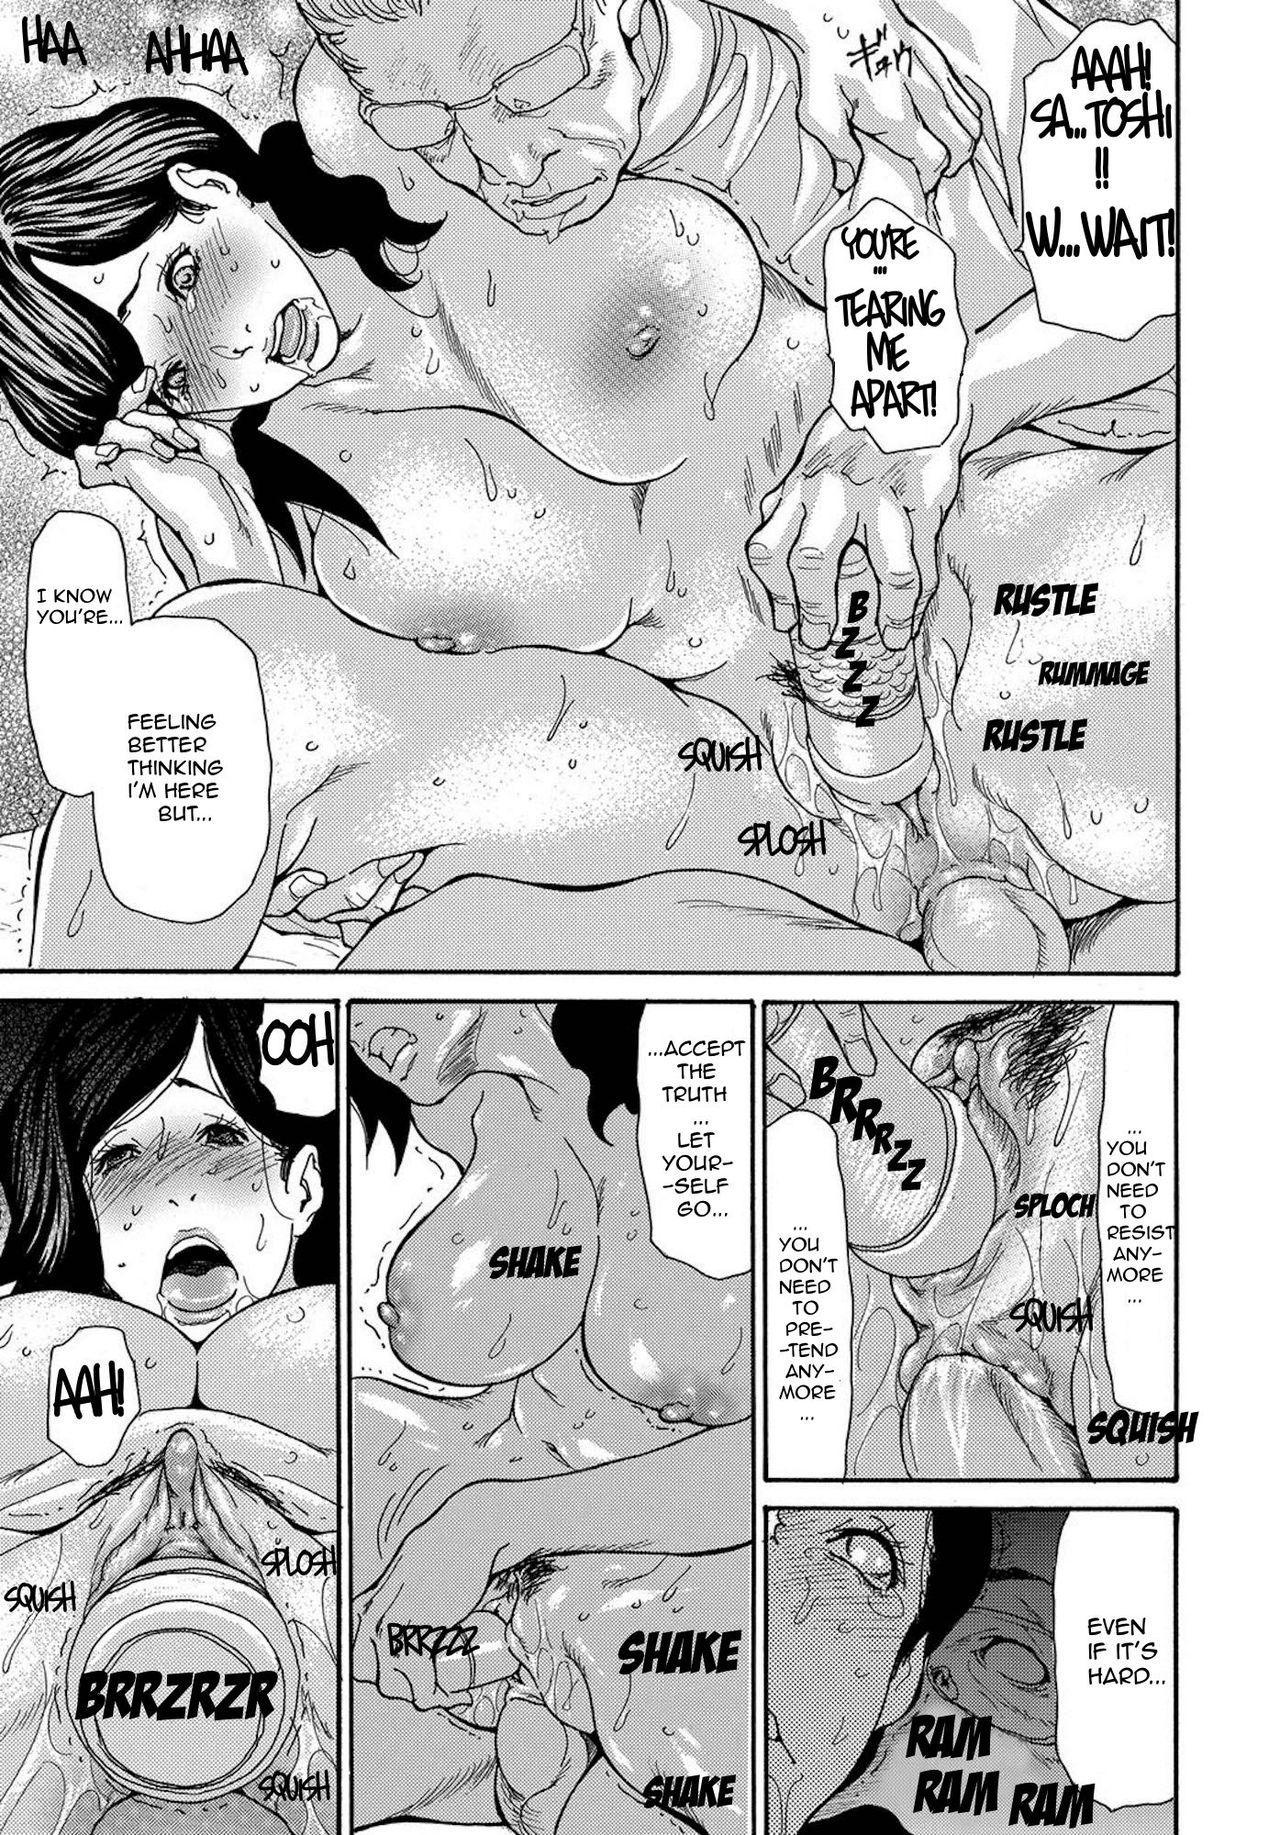 Miboujin Konsui Rinkan   The Widow Coma Gangrape Ch. 1-4 56